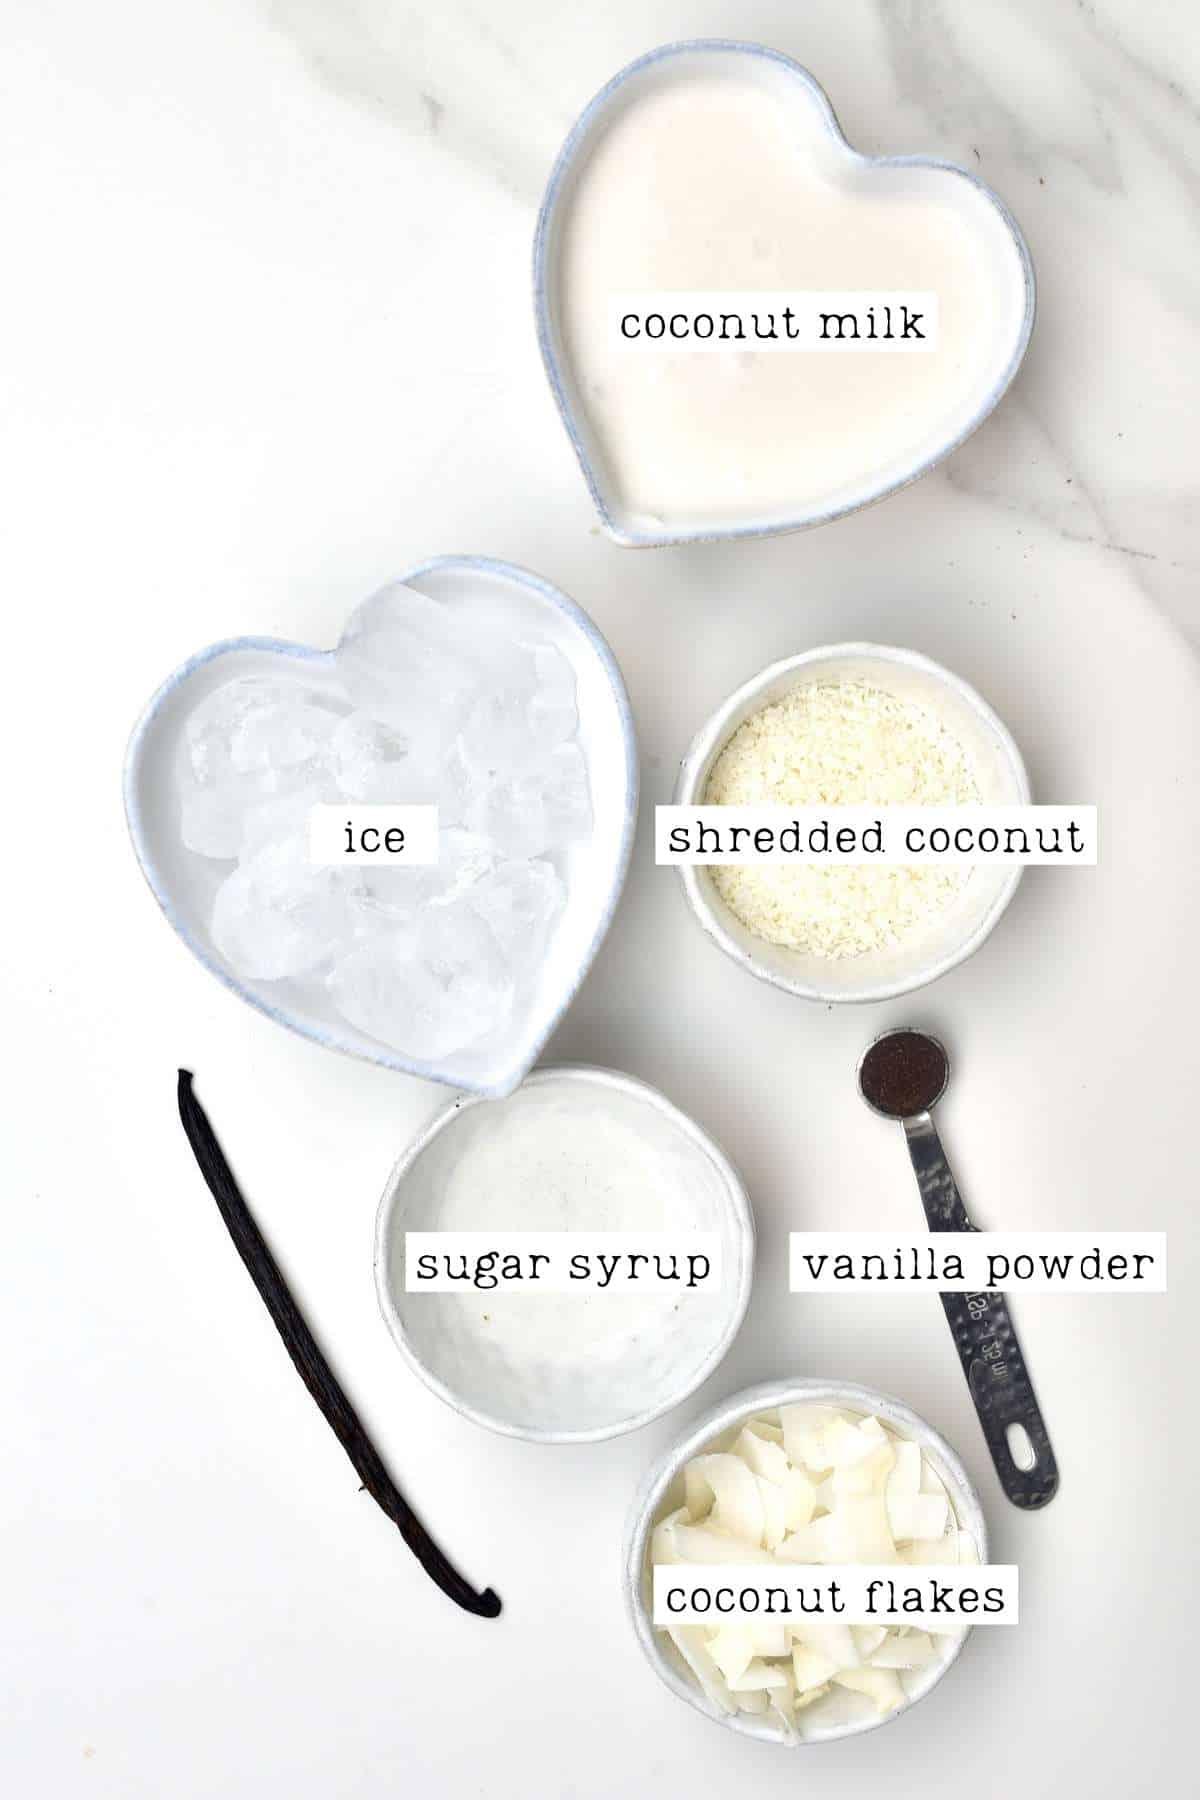 Ingredients for coconut frappe